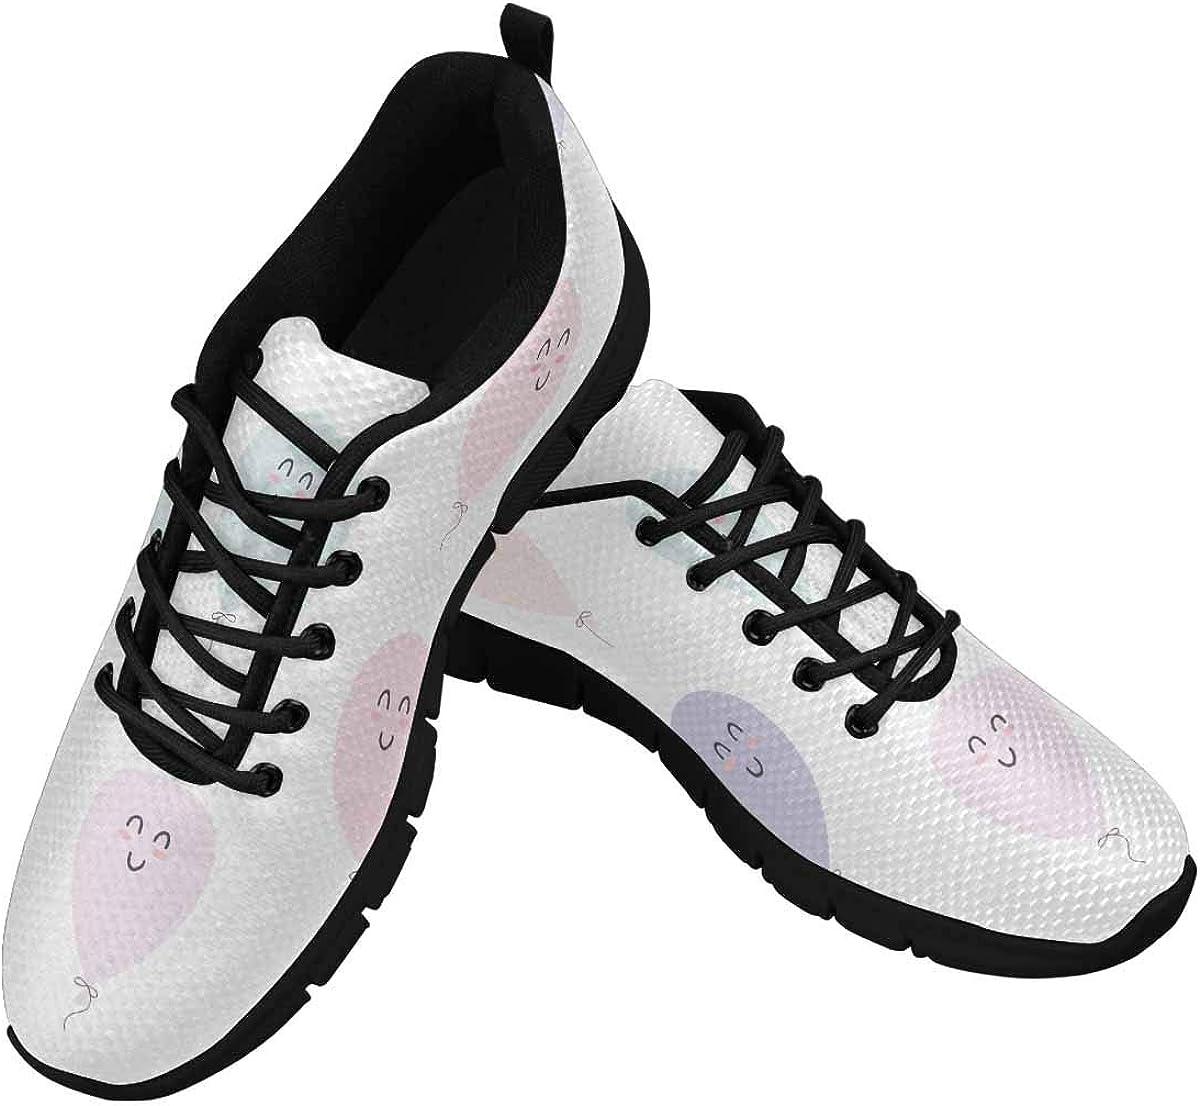 INTERESTPRINT Balloons Pattern Women Walking Shoes Comfortable Lightweight Work Casual Travel Sneakers